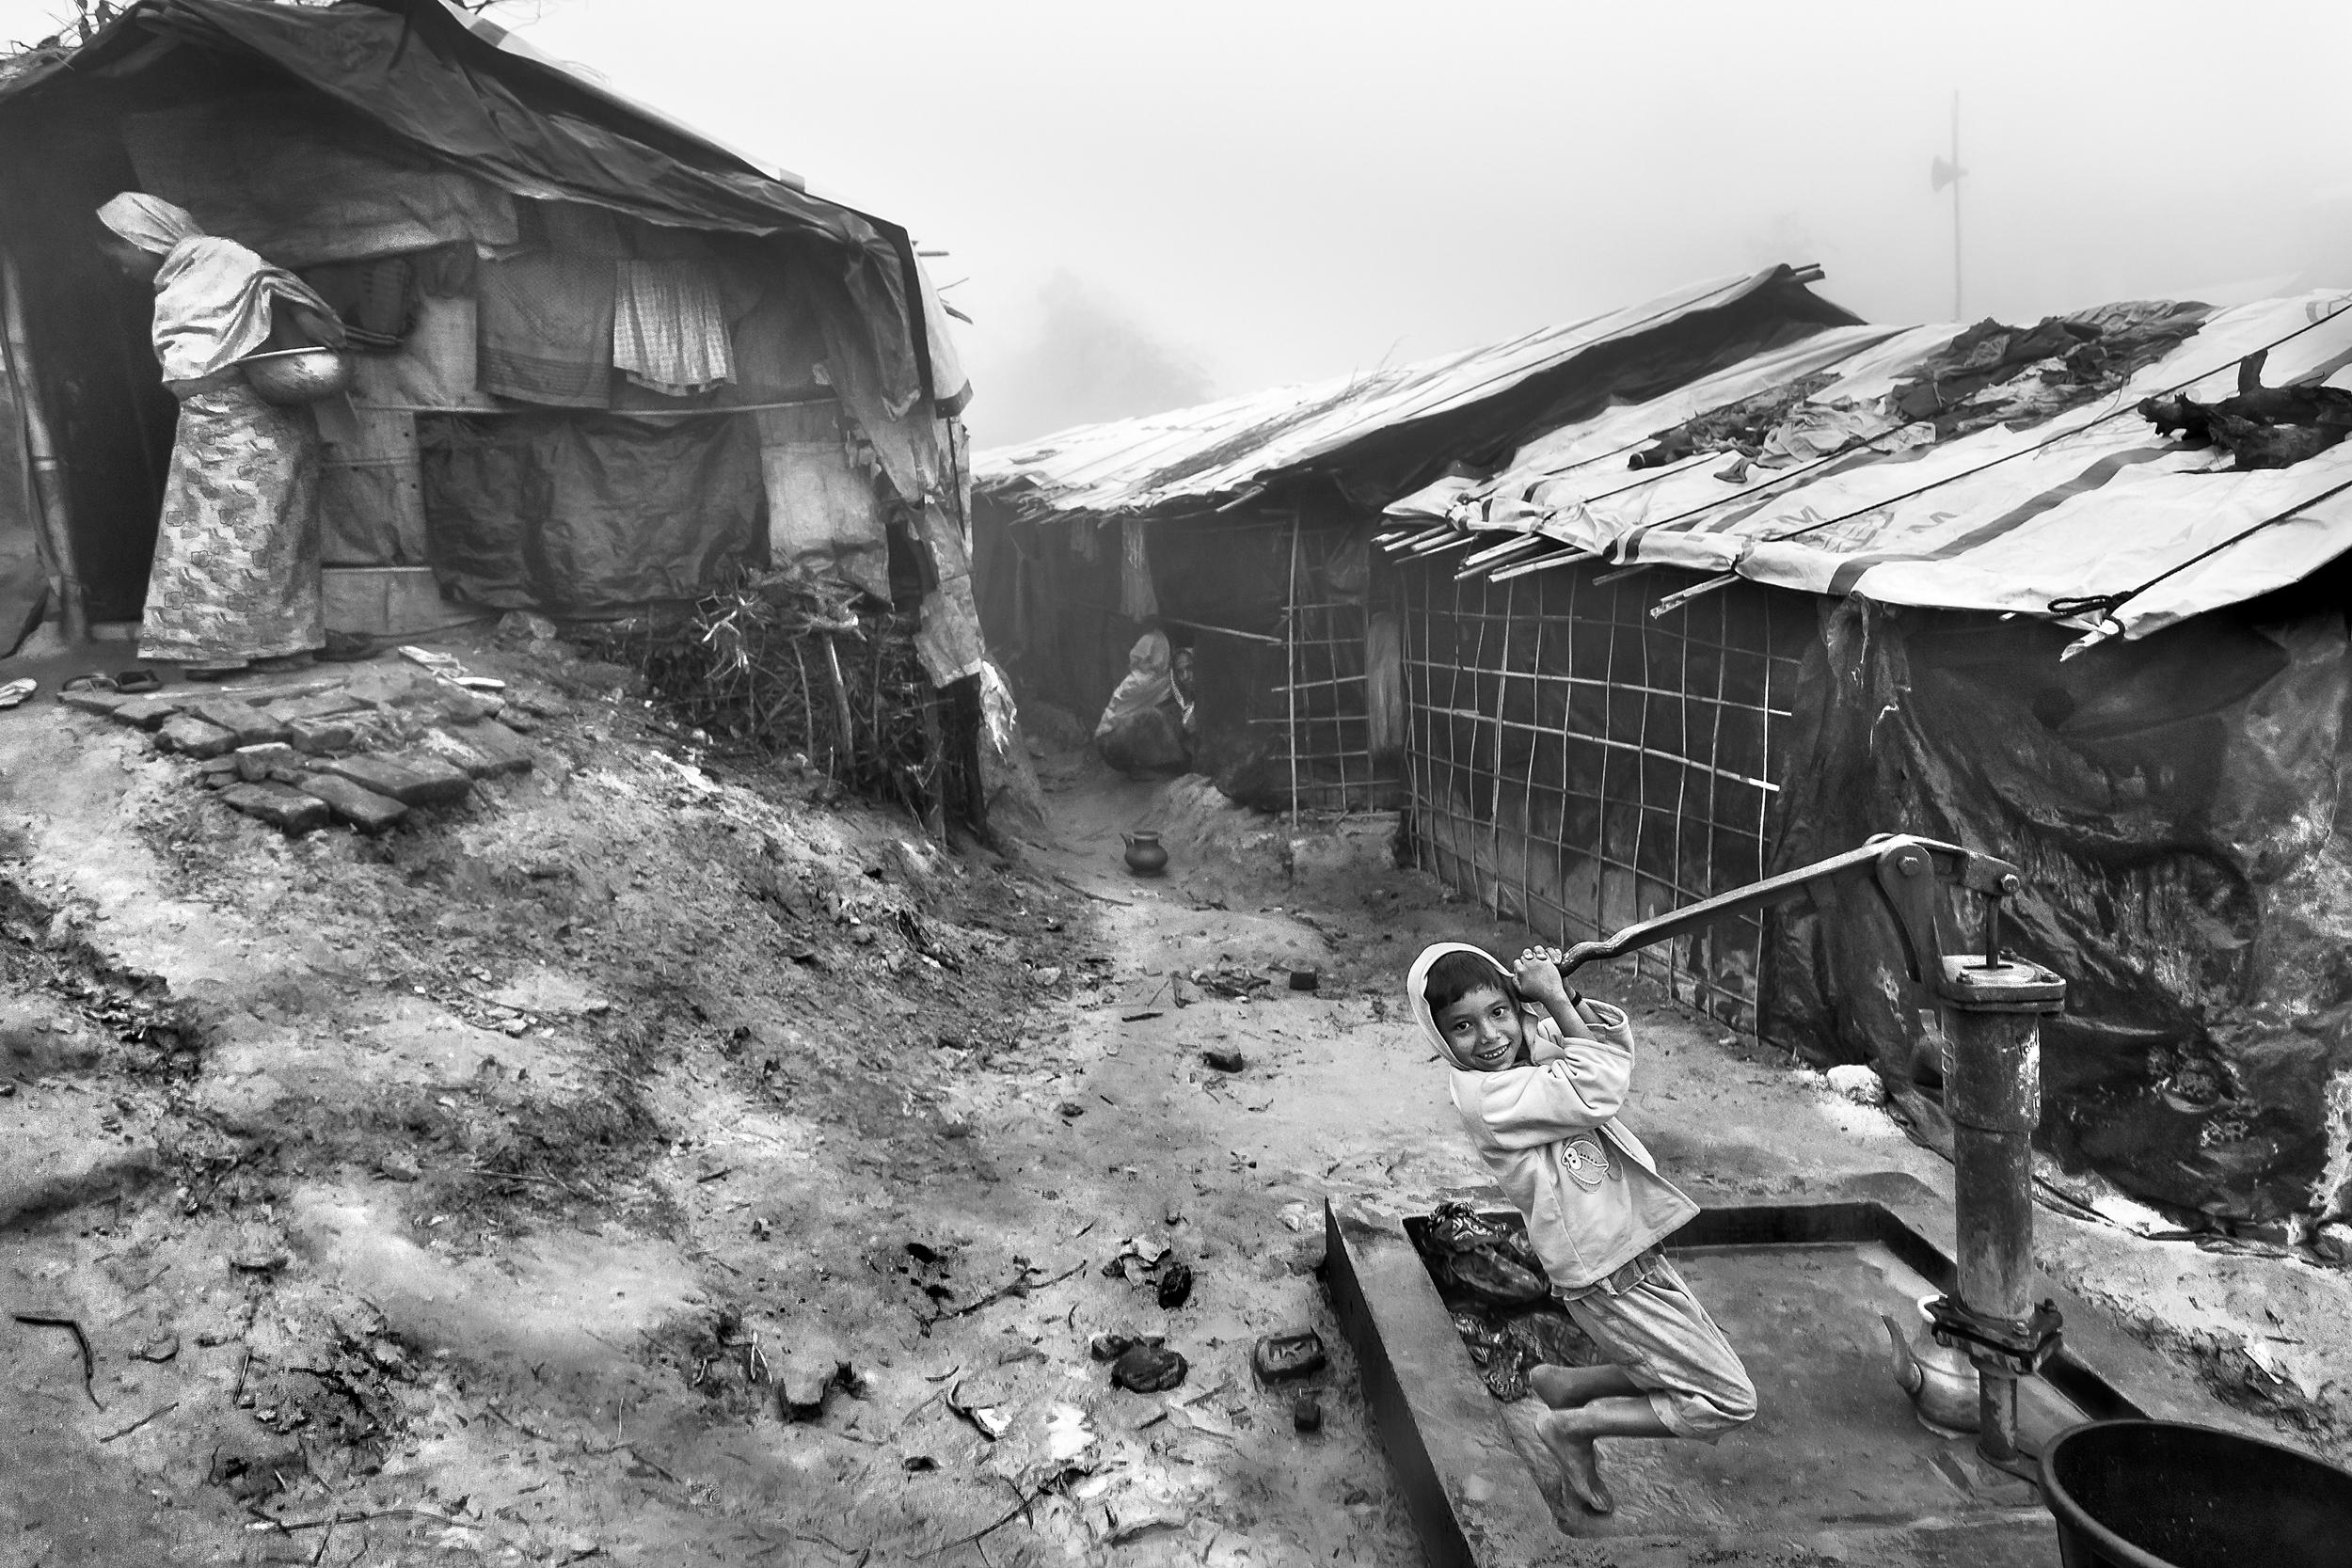 LouieLarry_Rohingya9.jpg